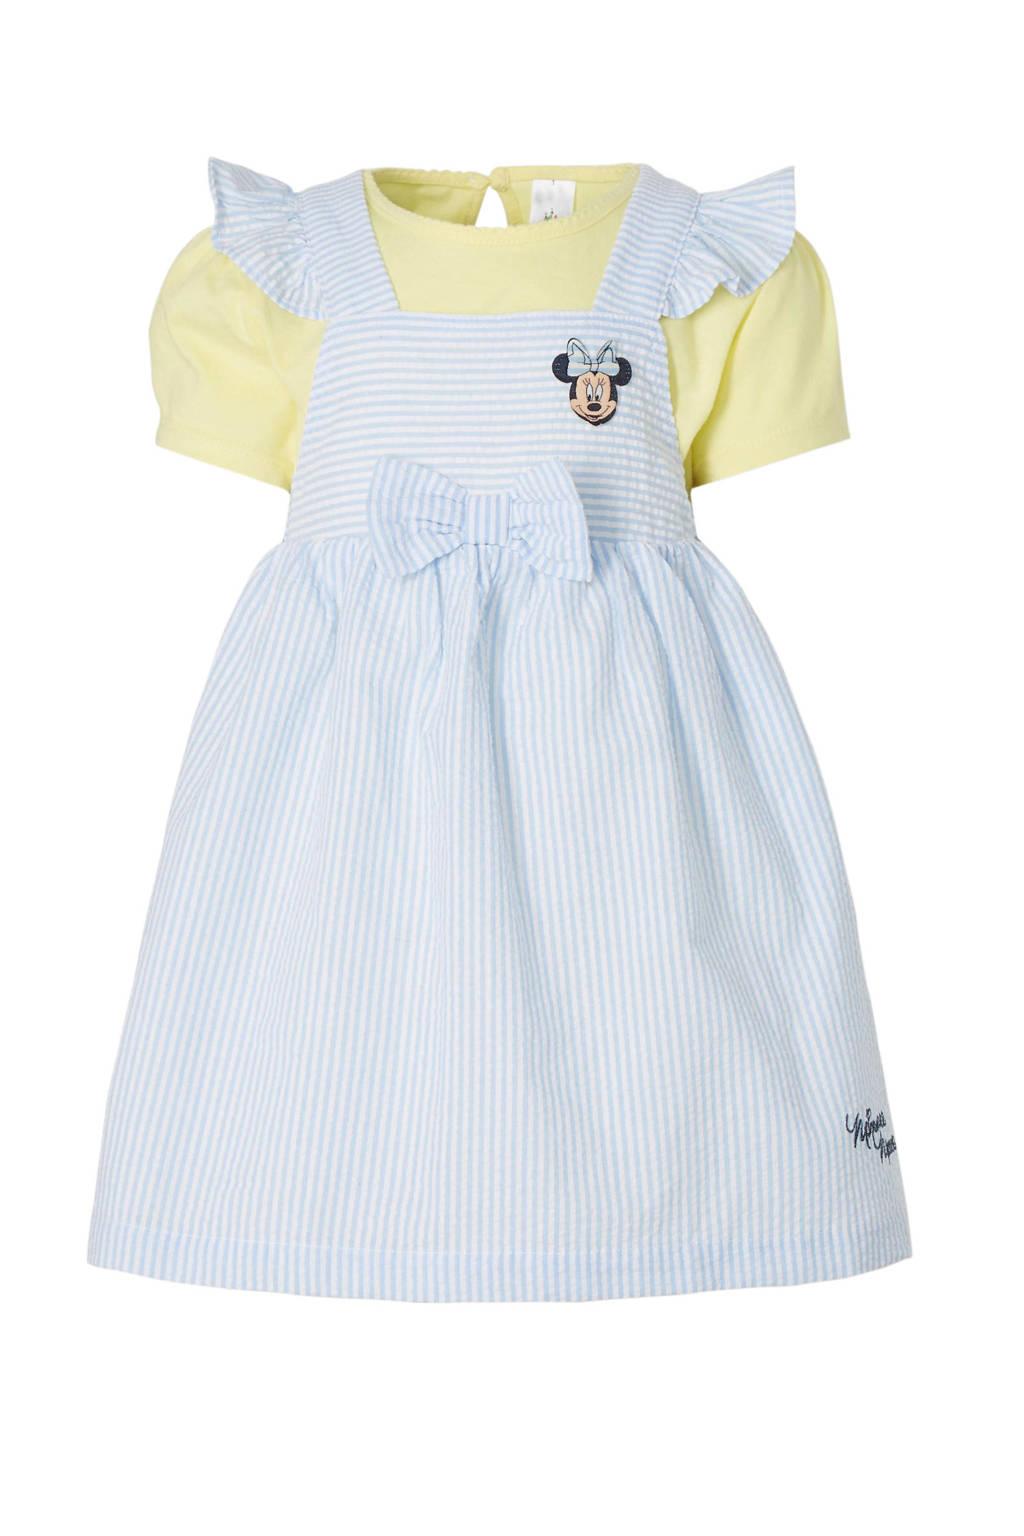 C&A Baby Club Minnie Mouse jurk + T-shirt, Blauw/wit/geel